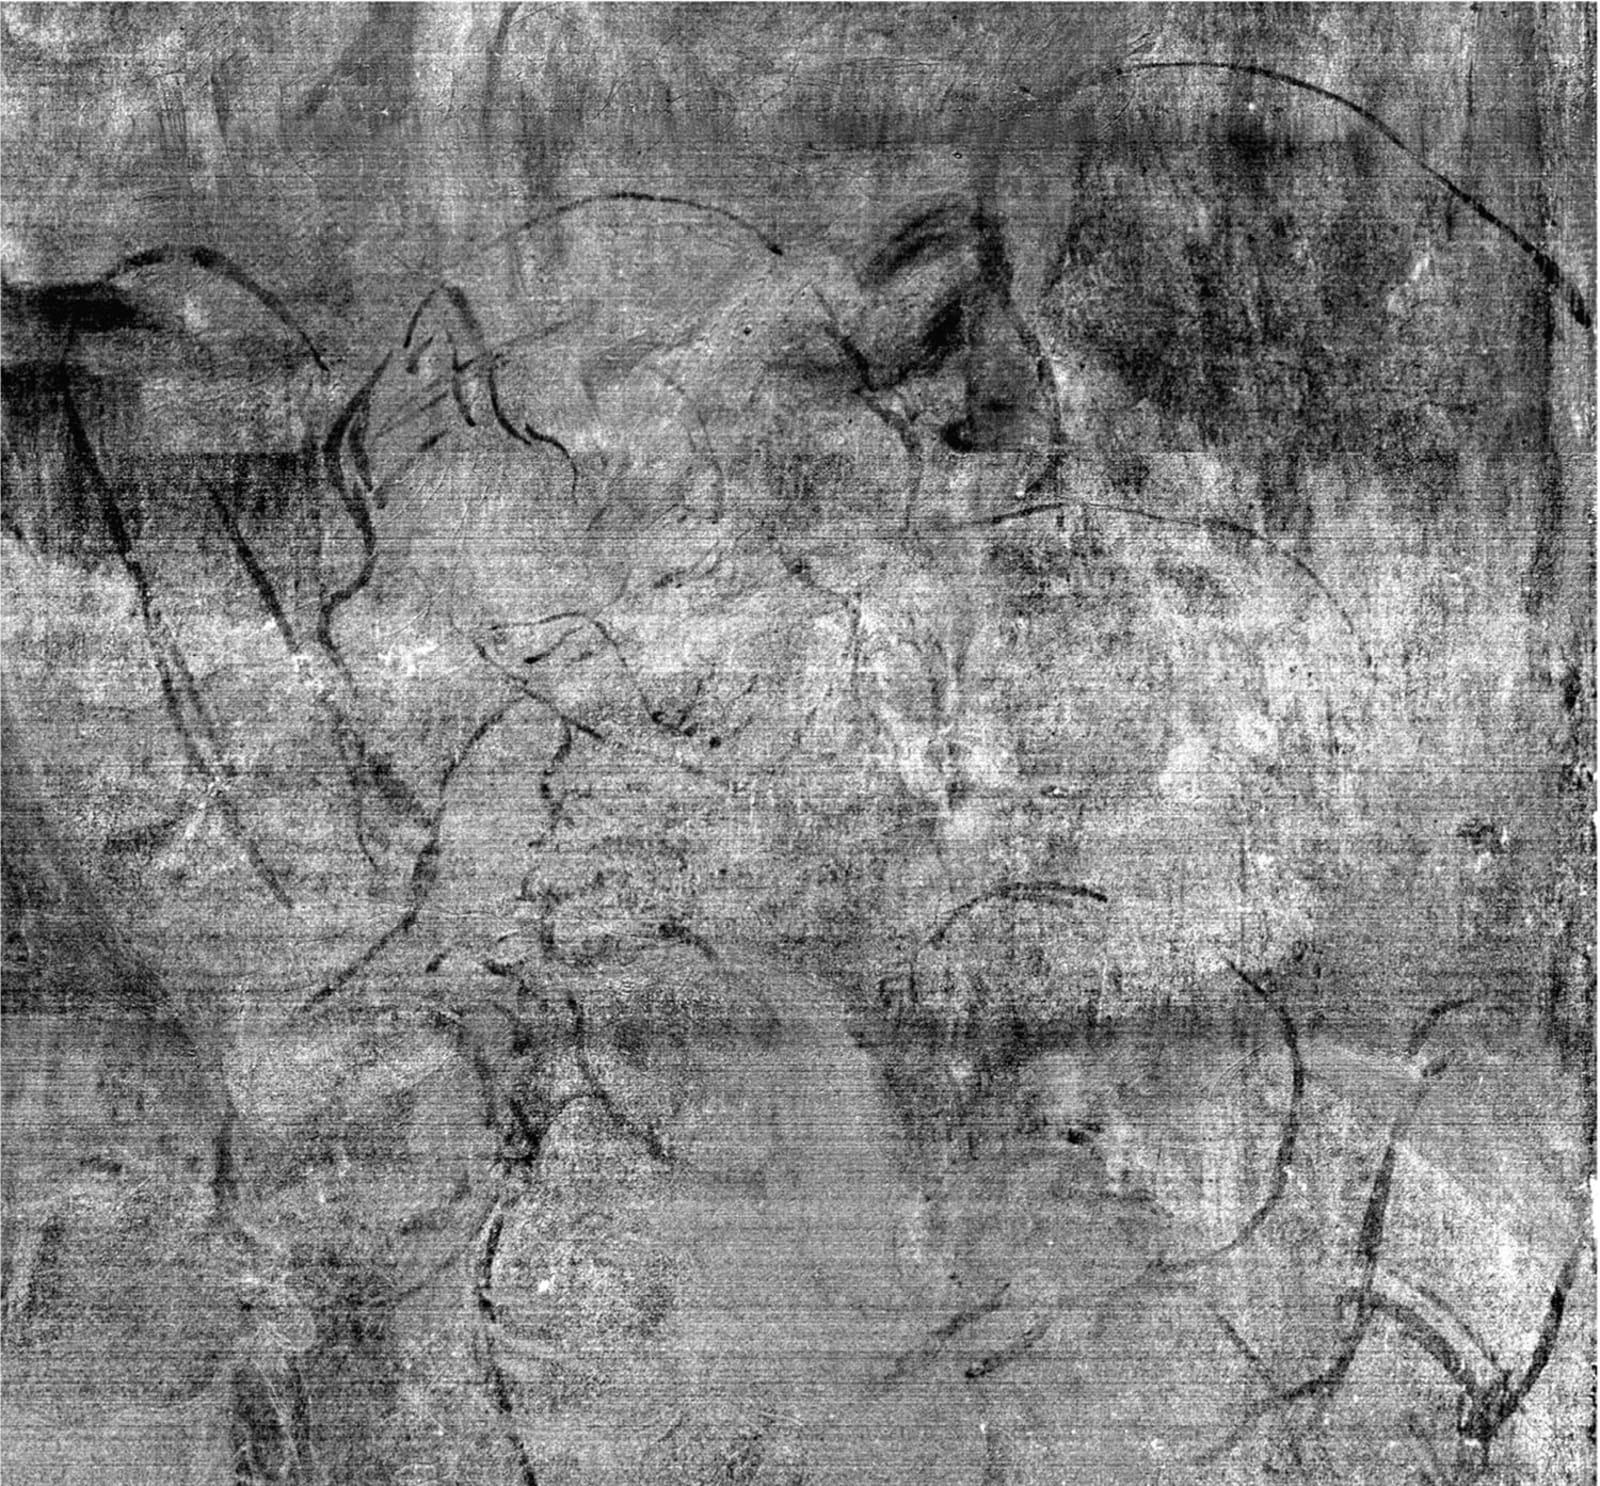 da Vinci The Virgin of the Rocks underpainting